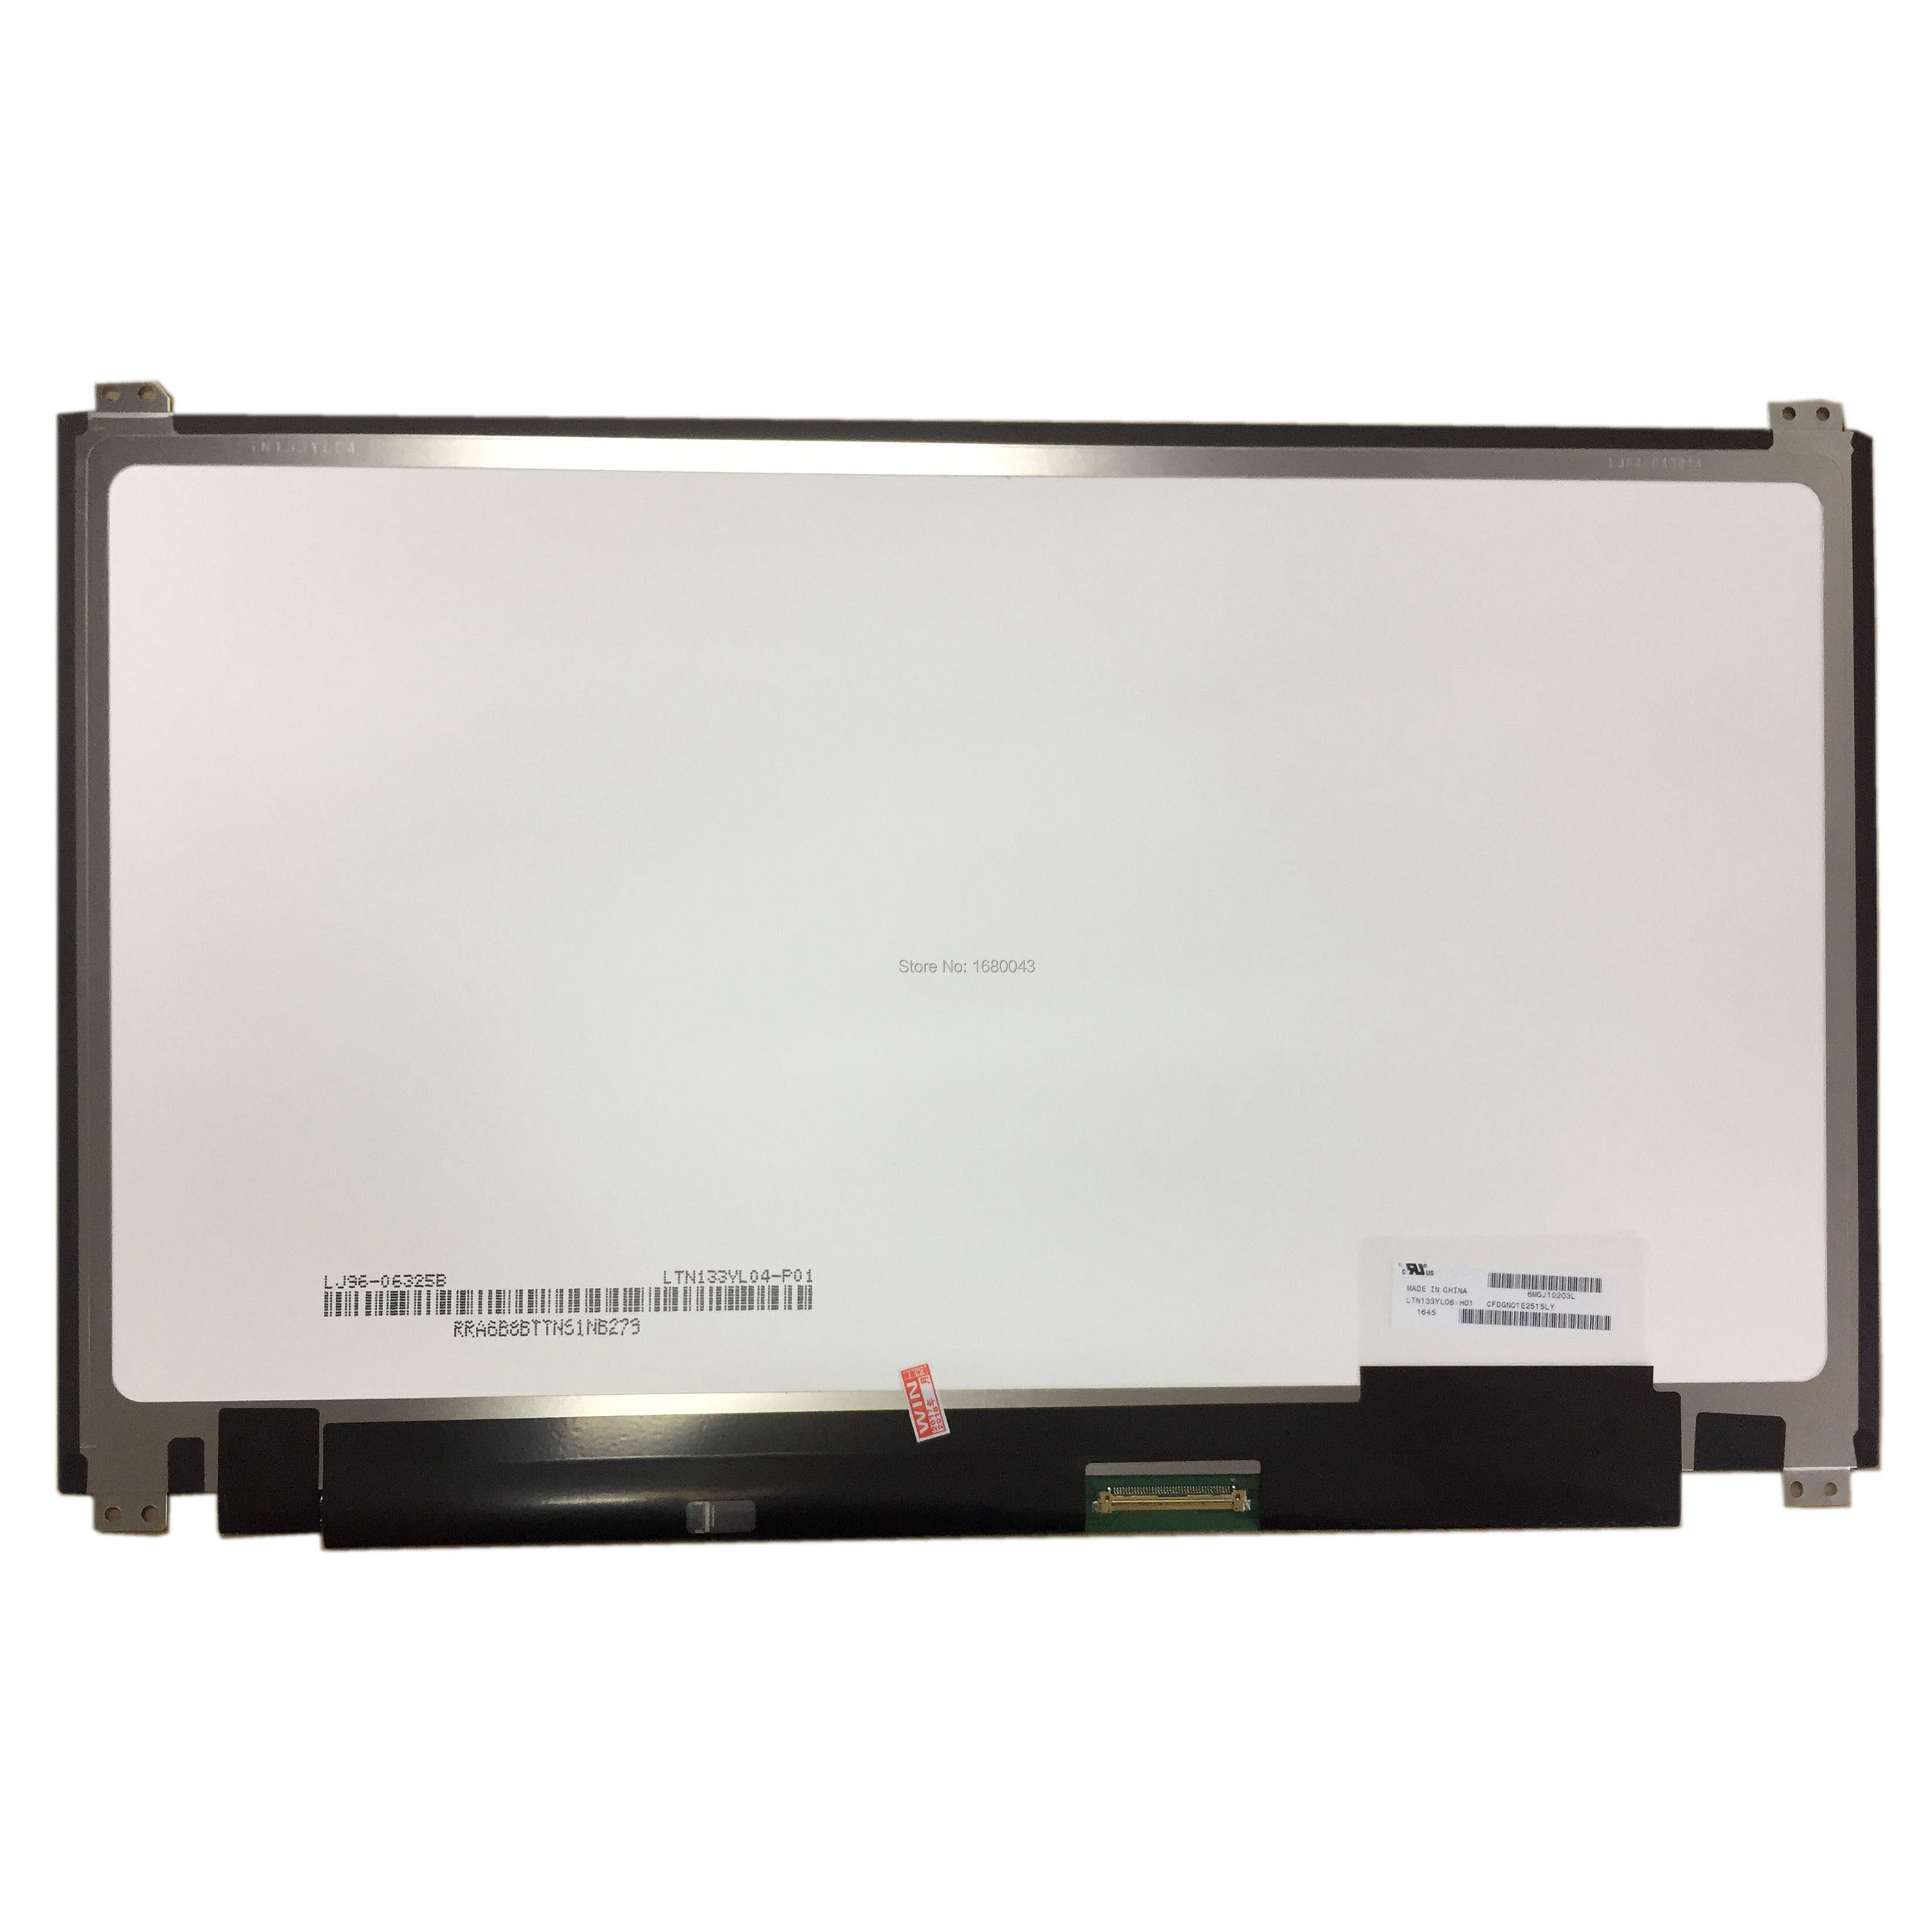 LTN133YL06 H01 LTN133YL06-H01 fit LTN133YL04 13.3 3K LED LCD Screen display IPS 3200x1800 OriginalLTN133YL06 H01 LTN133YL06-H01 fit LTN133YL04 13.3 3K LED LCD Screen display IPS 3200x1800 Original